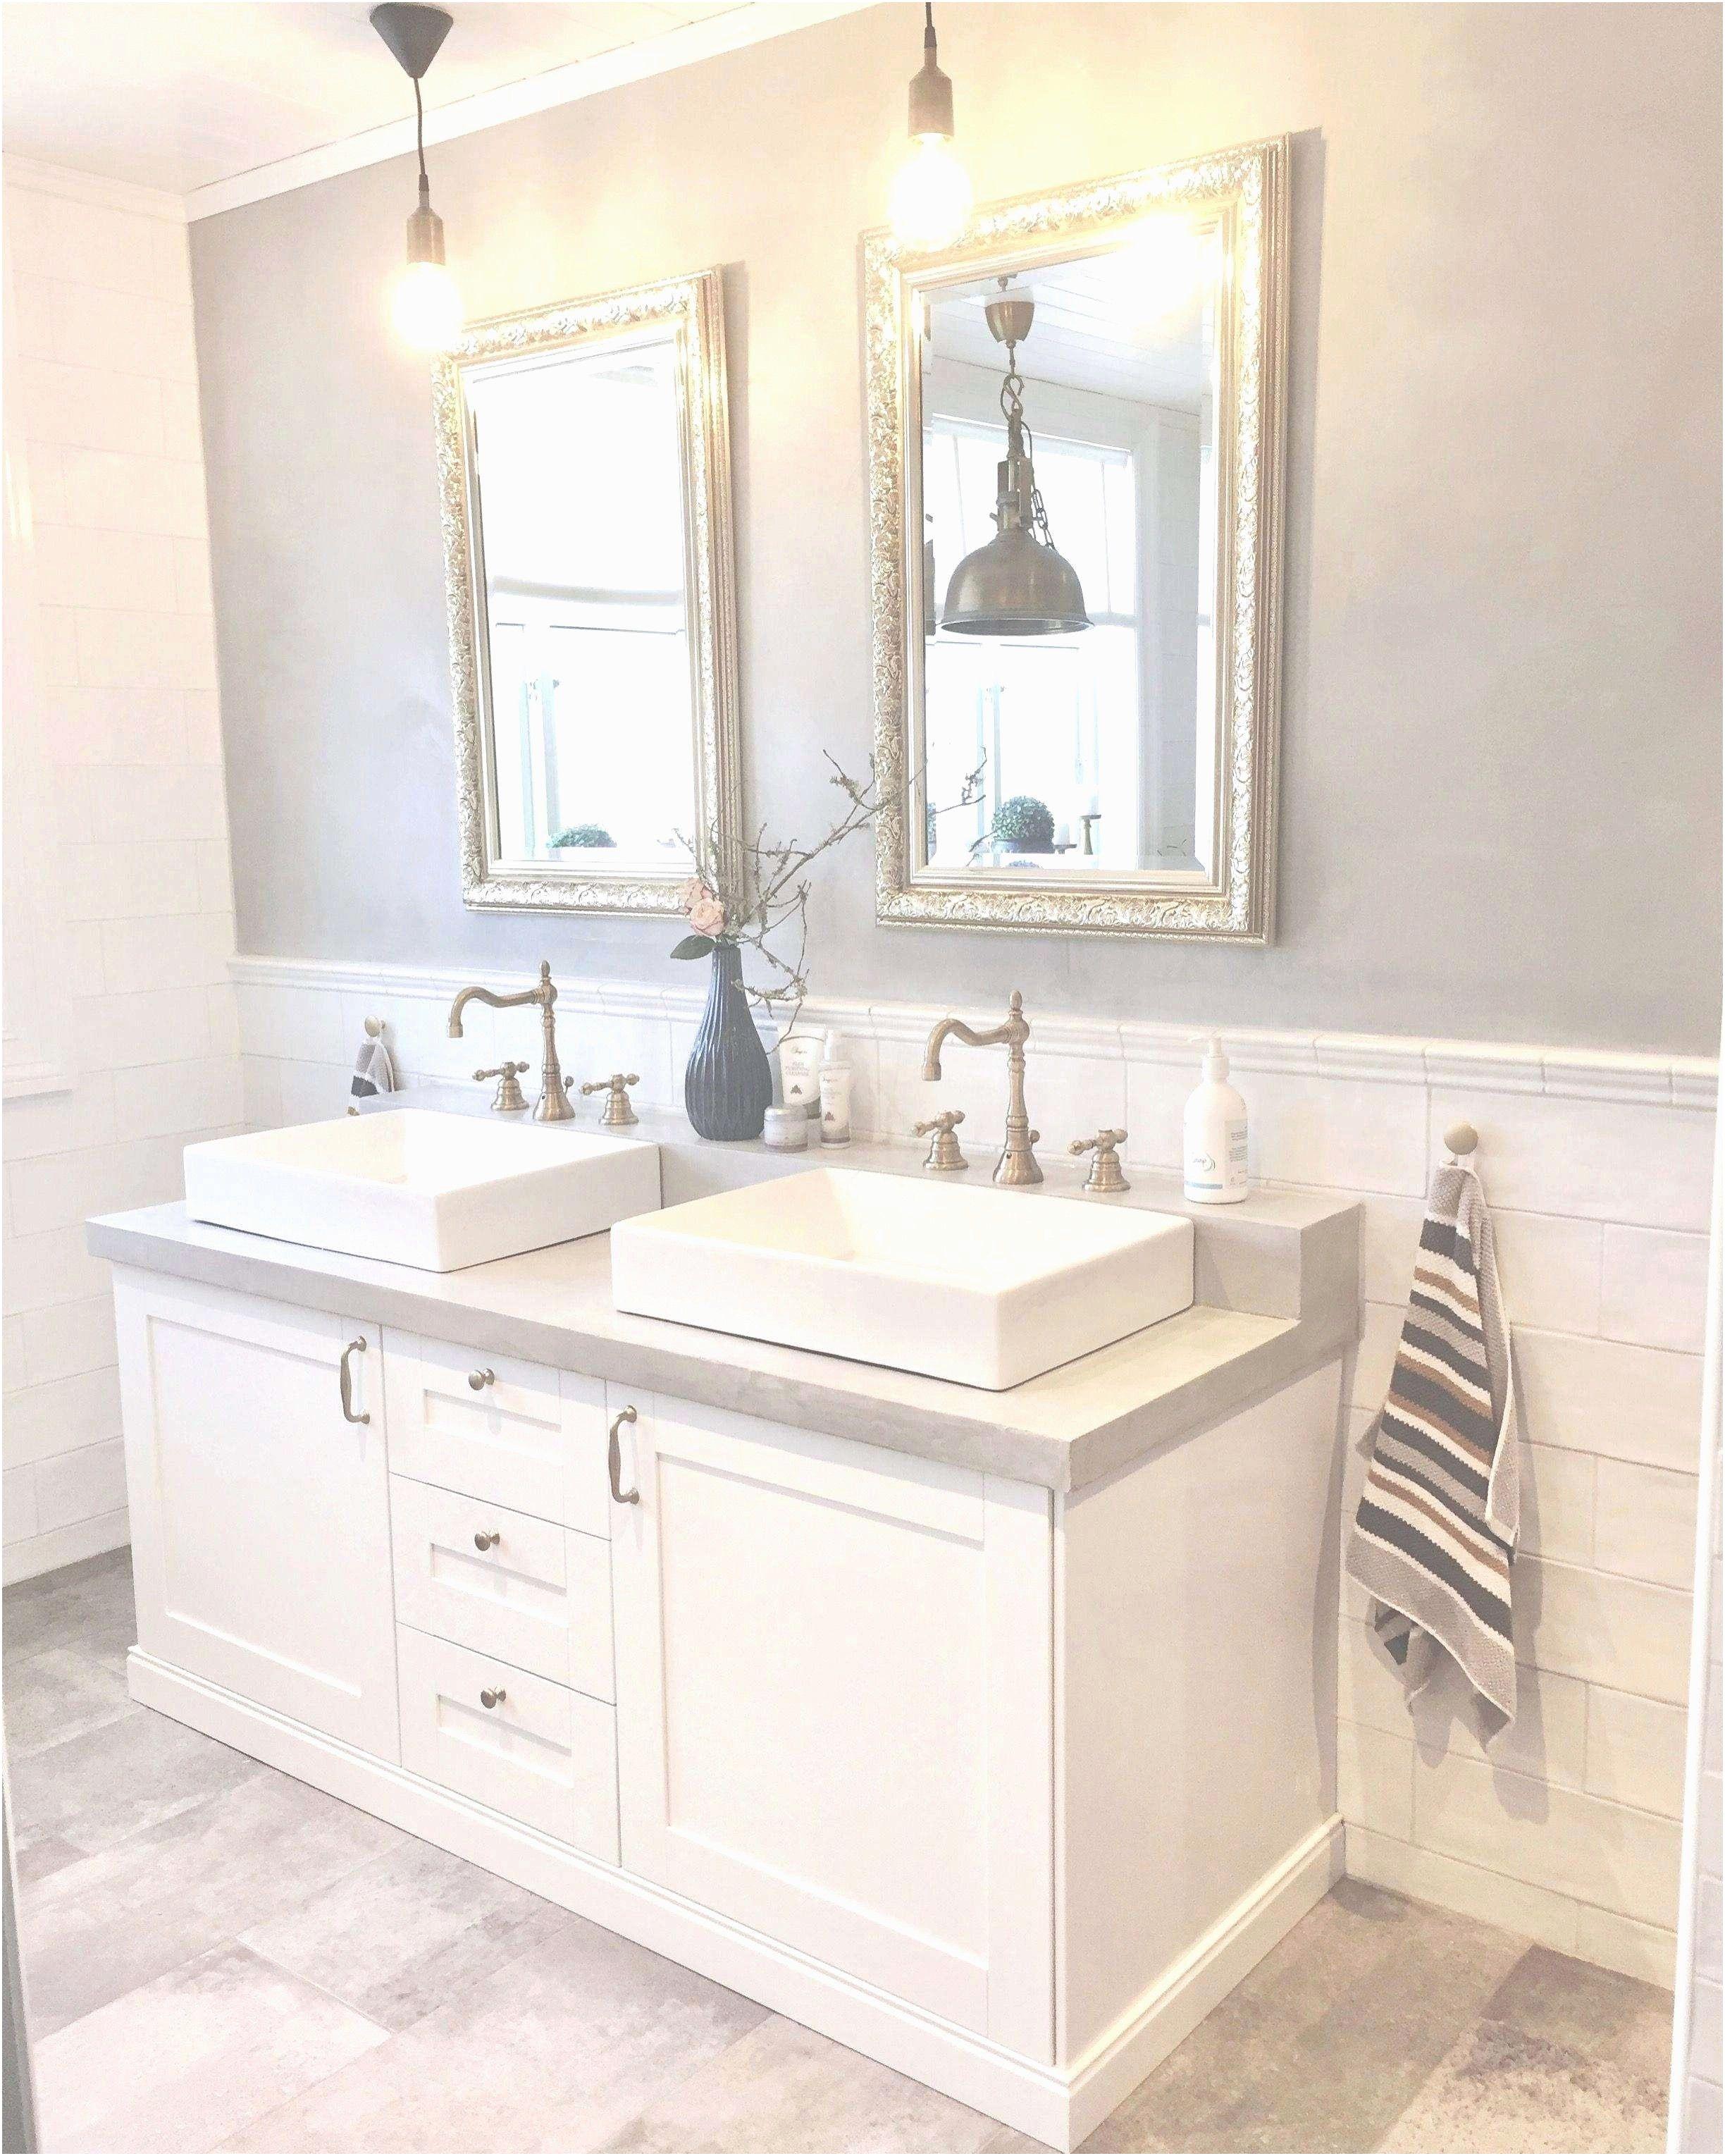 Ceramic Slate Floor Tiles Floor and Tile 19 Amazing Slate Bathroom Floor Tiles Peritile